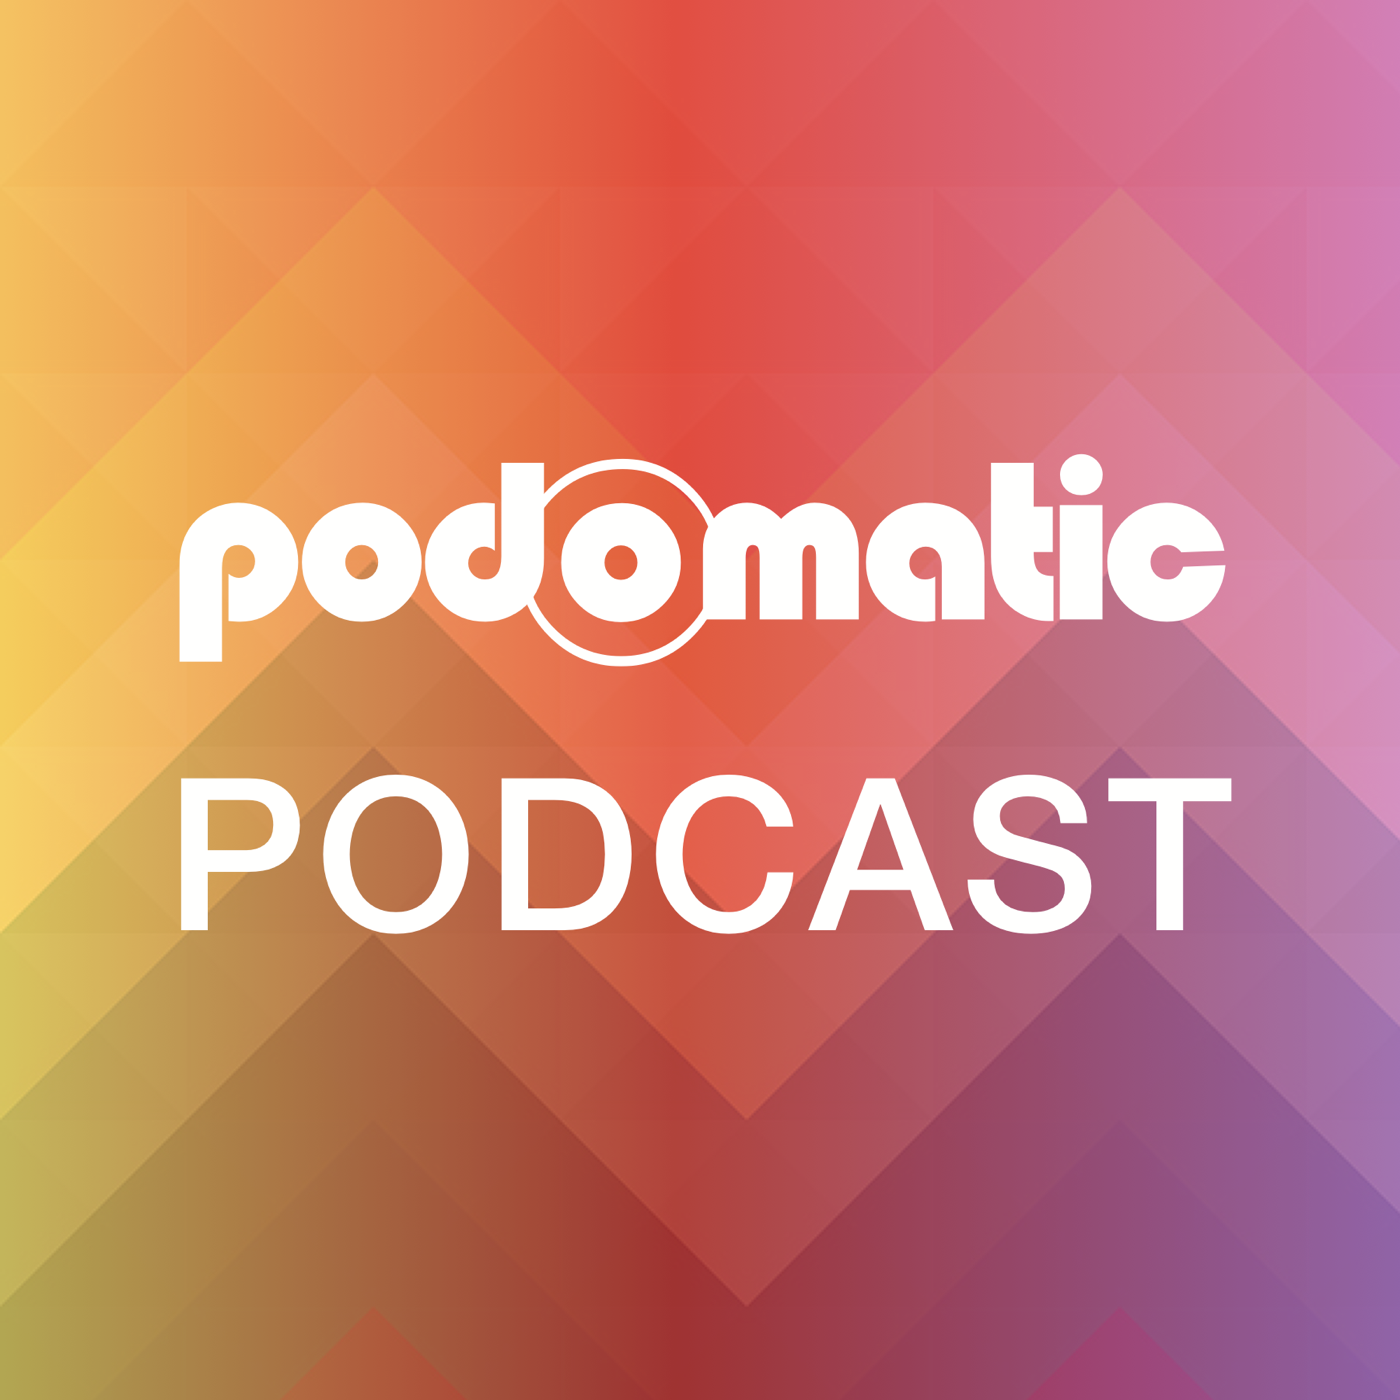 Patrick Lui's Podcast